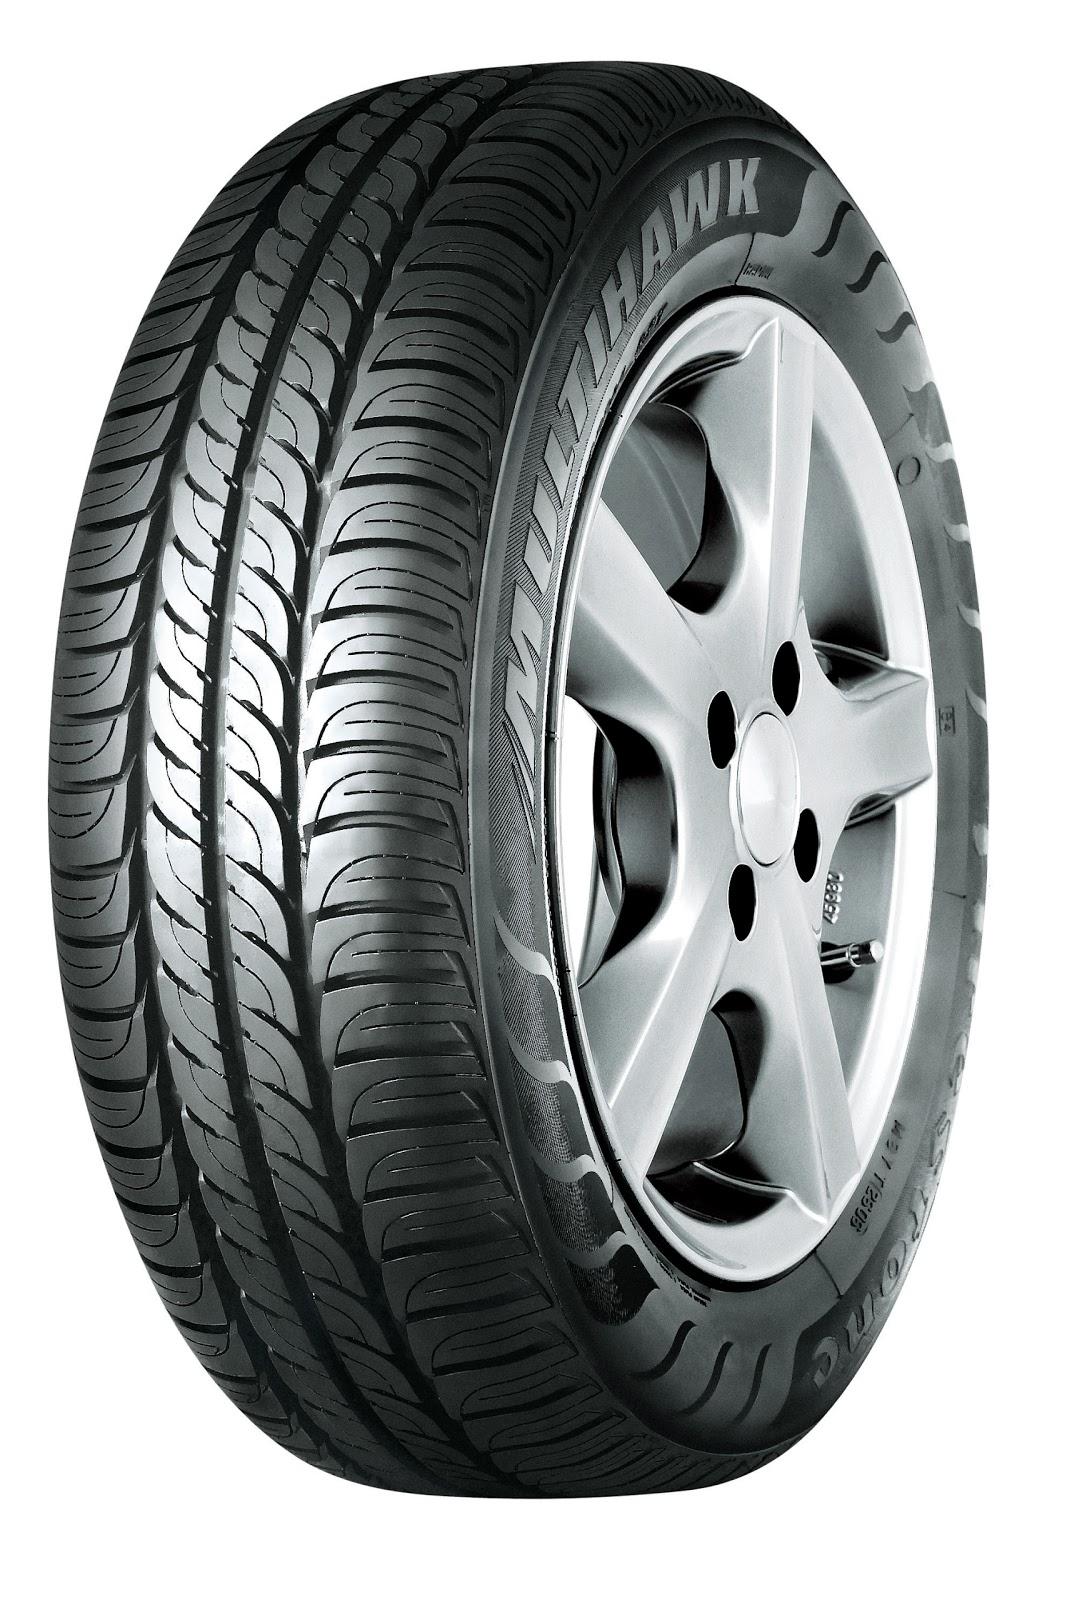 Bridgestone T Touring Bike High Quality Tires